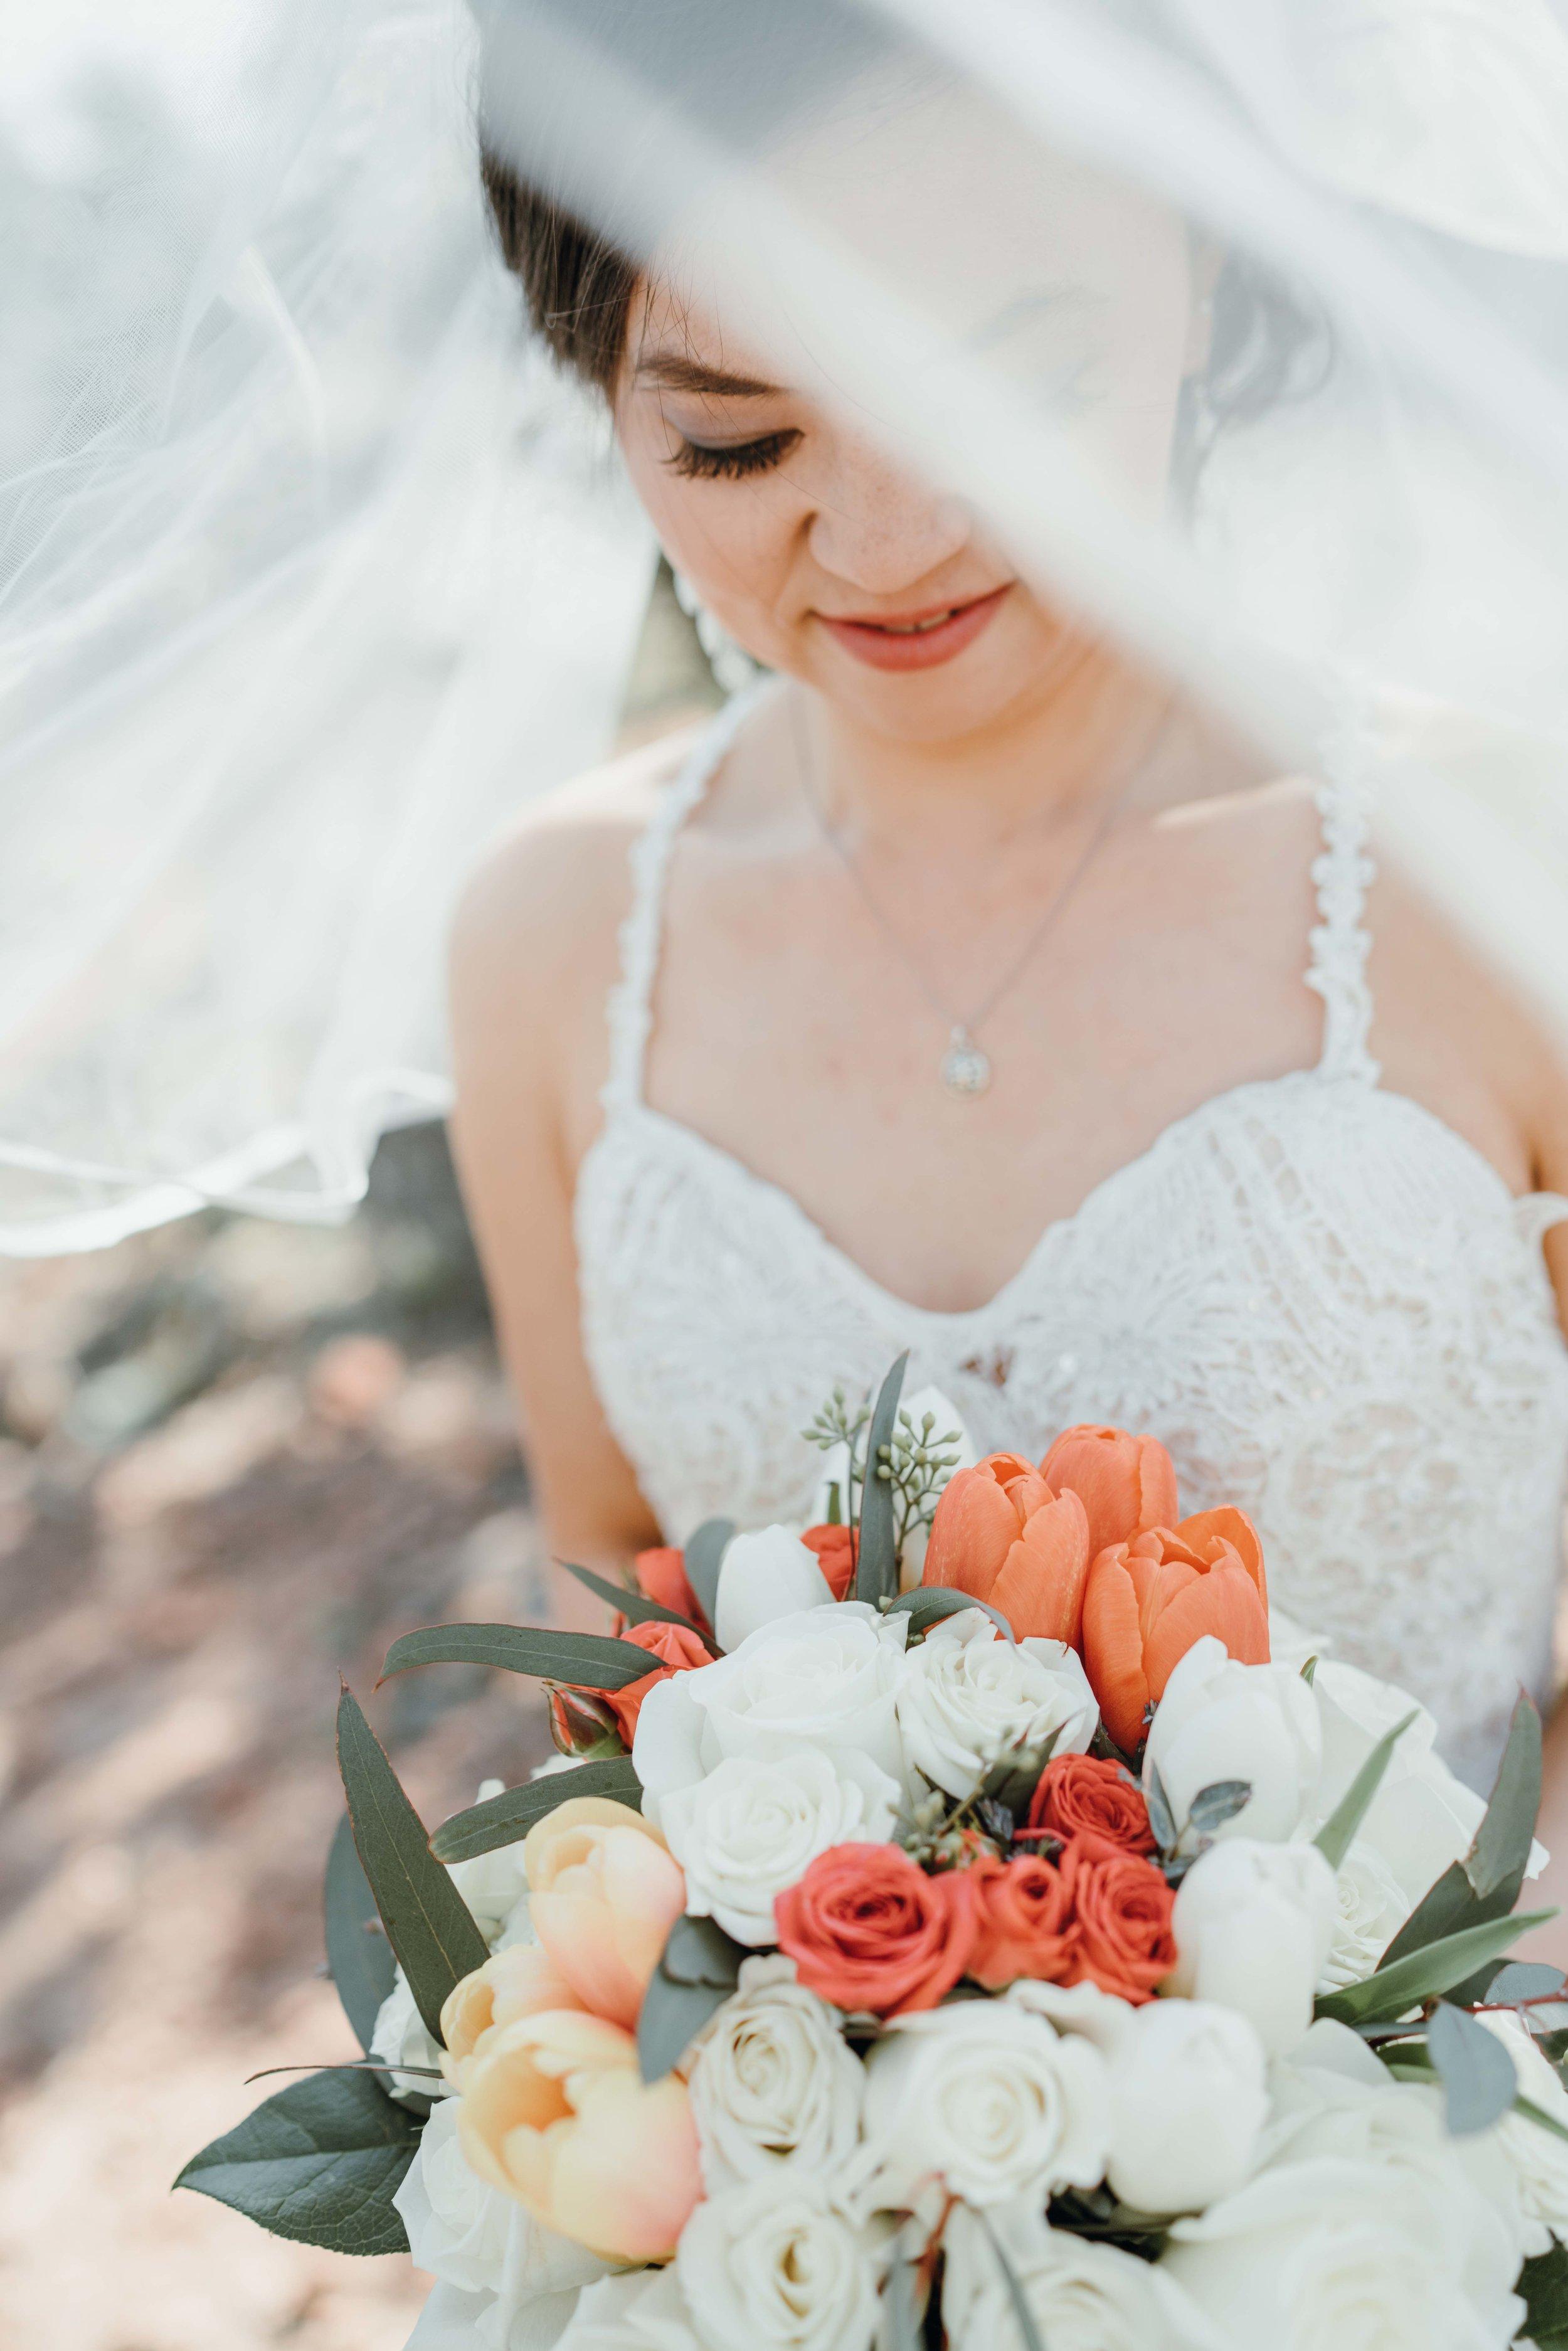 denver wedding photographer lioncrest manor in lyons ben and mali -DSC06178.jpg